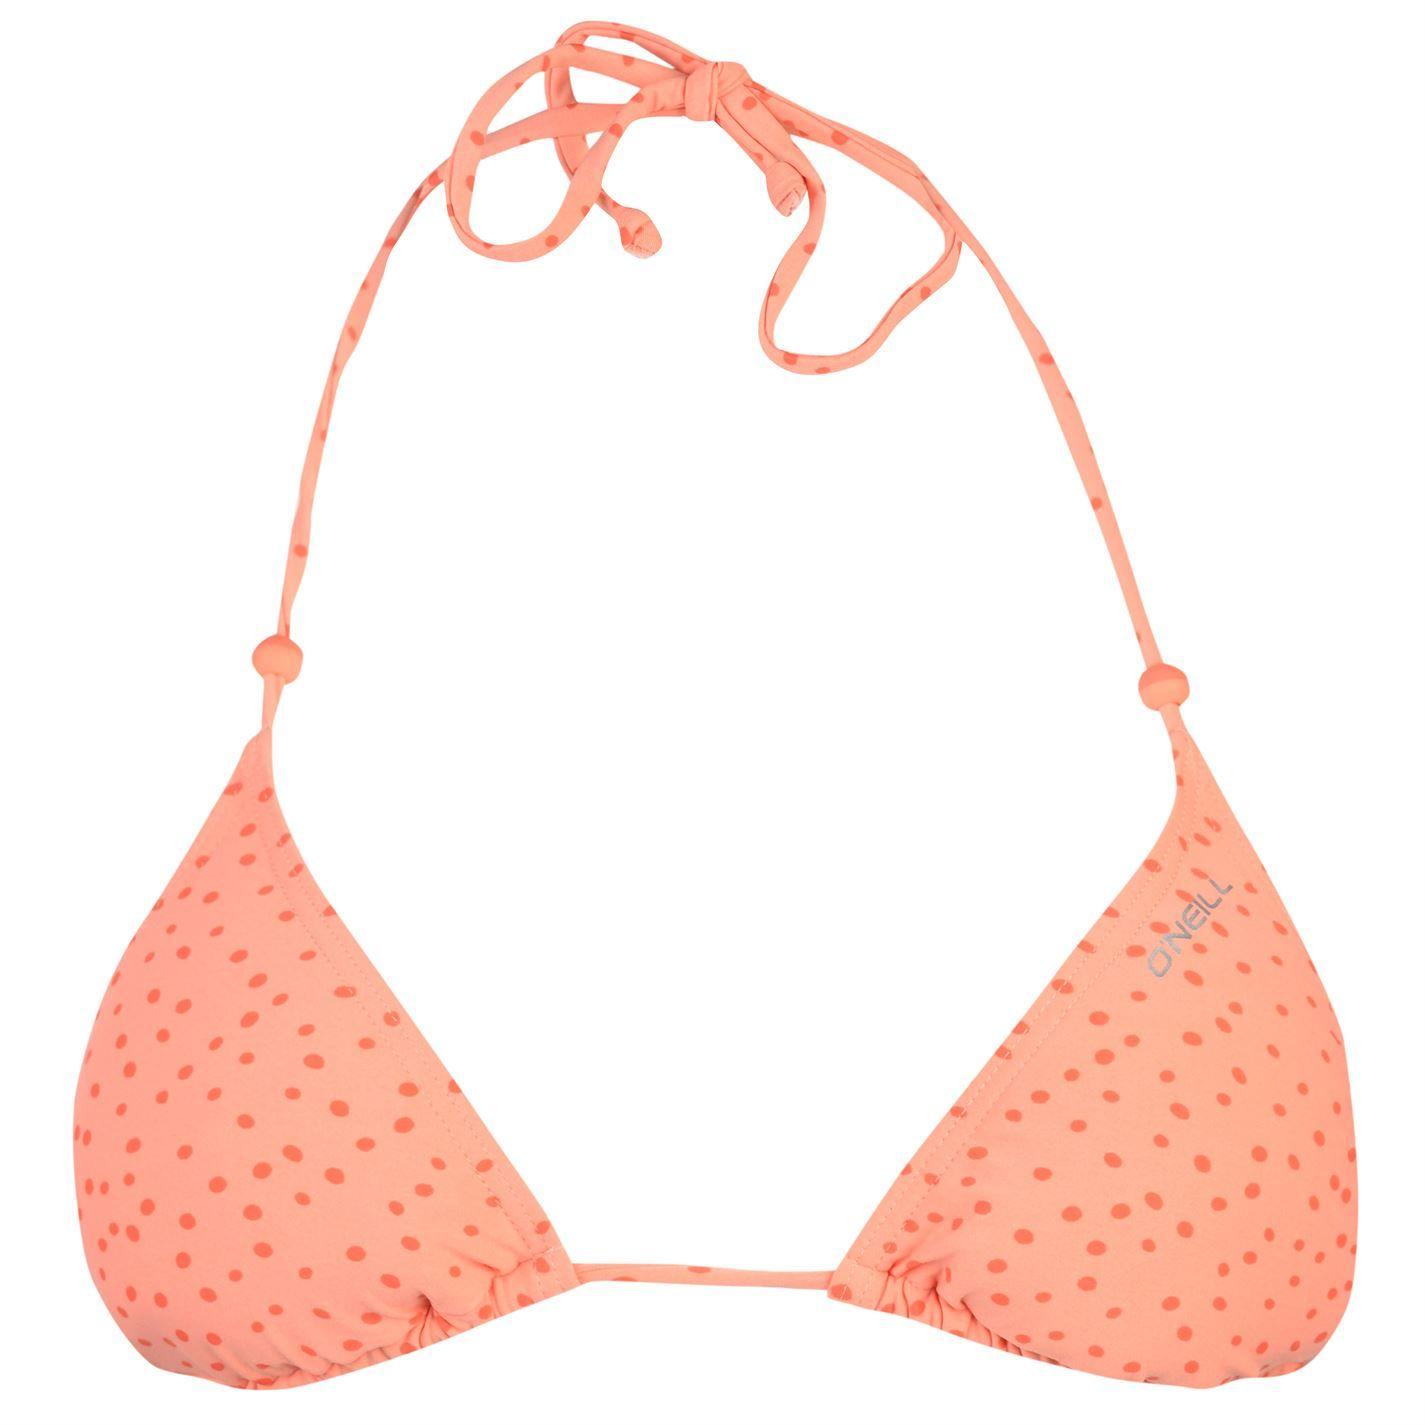 ONeill Womens MM Triangle Bikini Top Ladies Bra Spaghetti Straps Sea Pool Beach